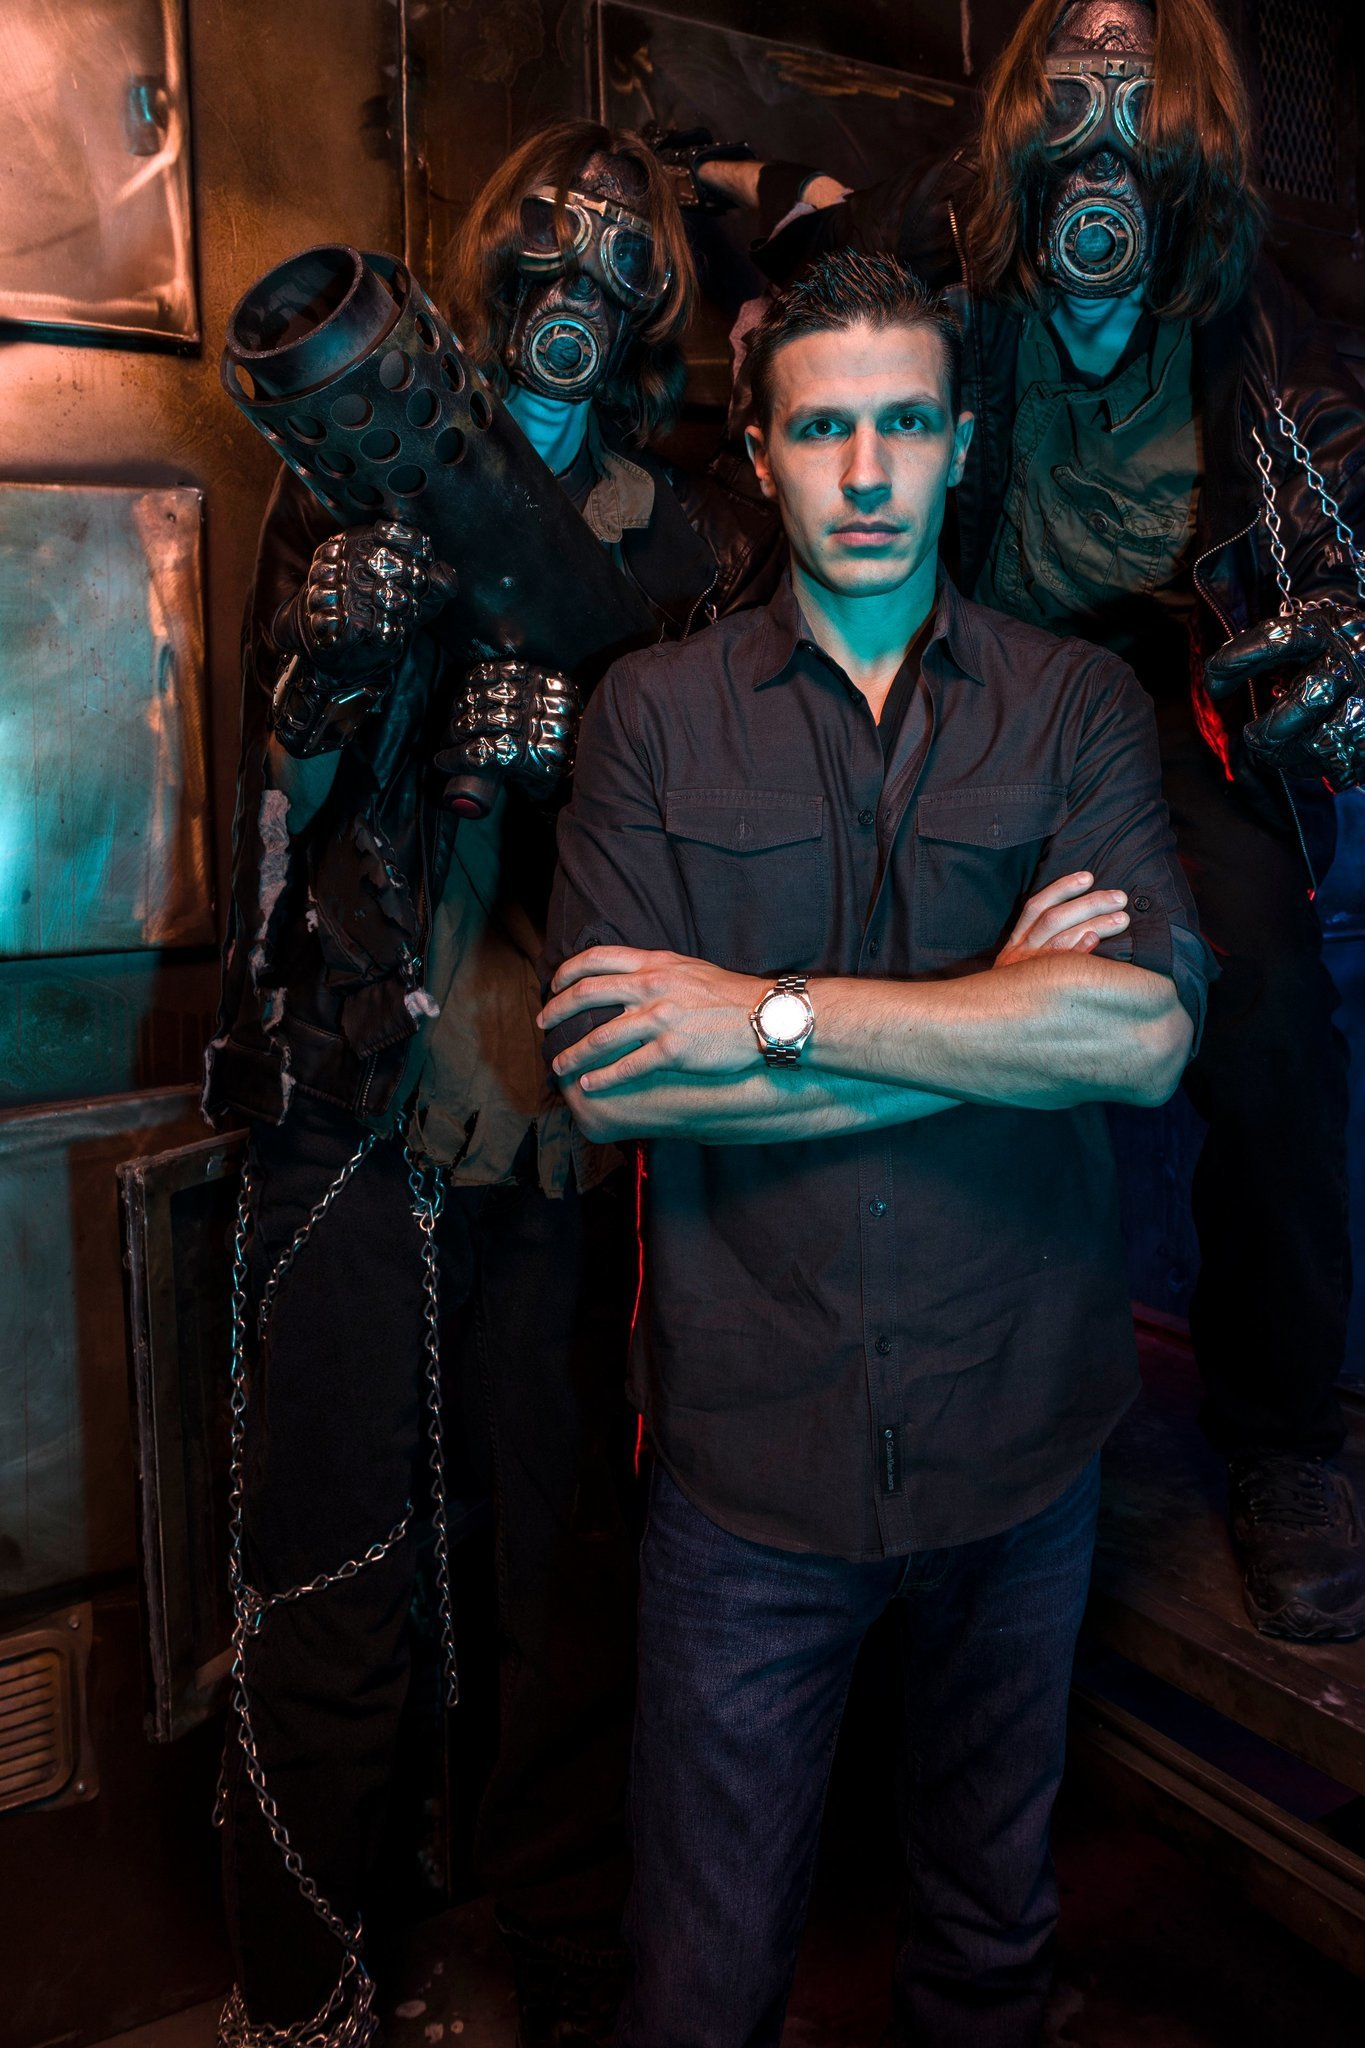 Escape Room Based On Saw Horror Films Opens In Las Vegas